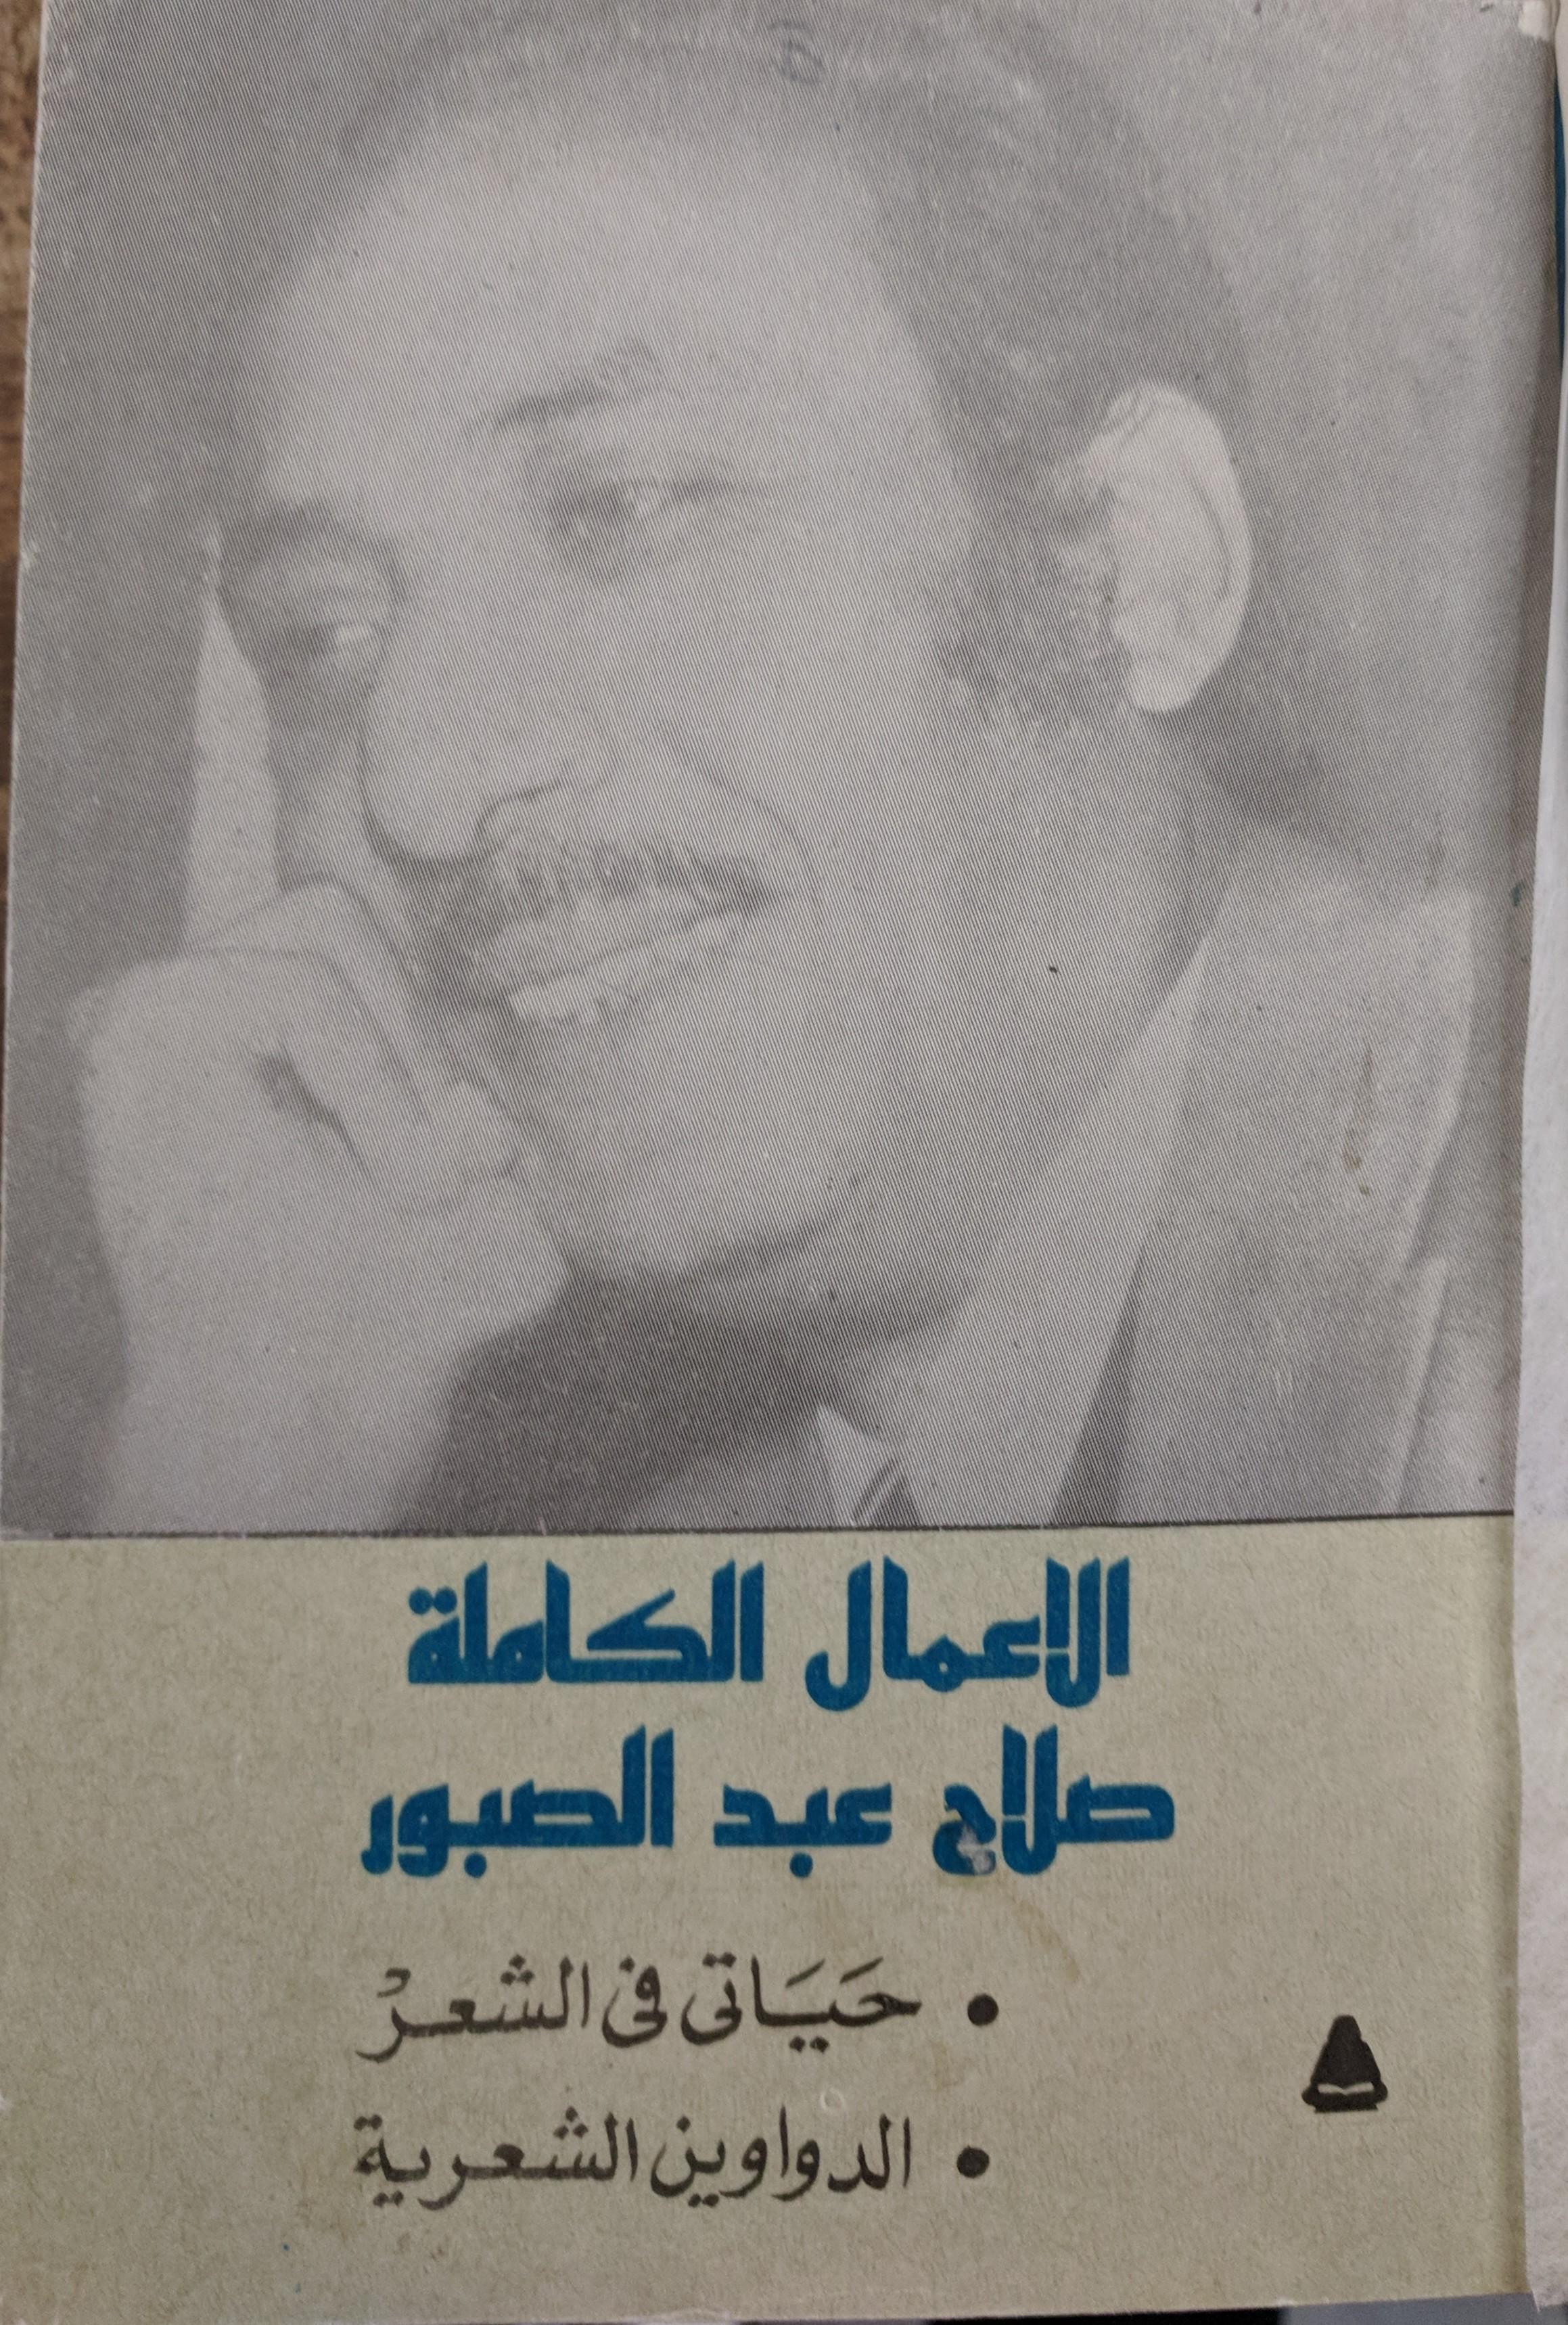 The Complete Works of Salah Abd Al-Sabur